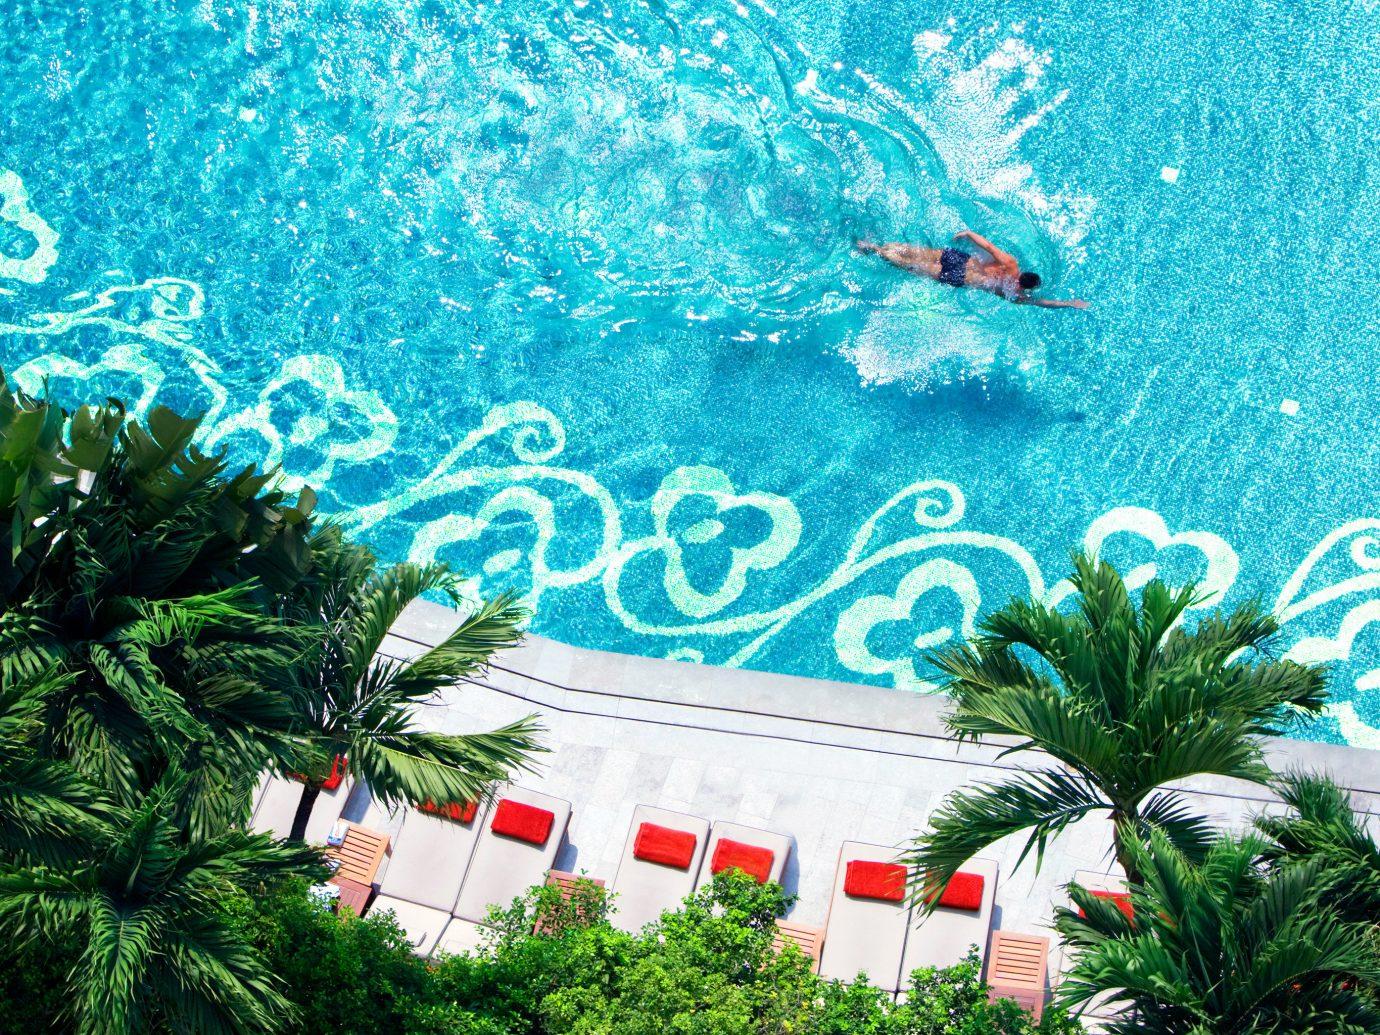 City Cultural Elegant Hotels Patio Pool Tropical Waterfront tree swimming pool plant Jungle ocean floor